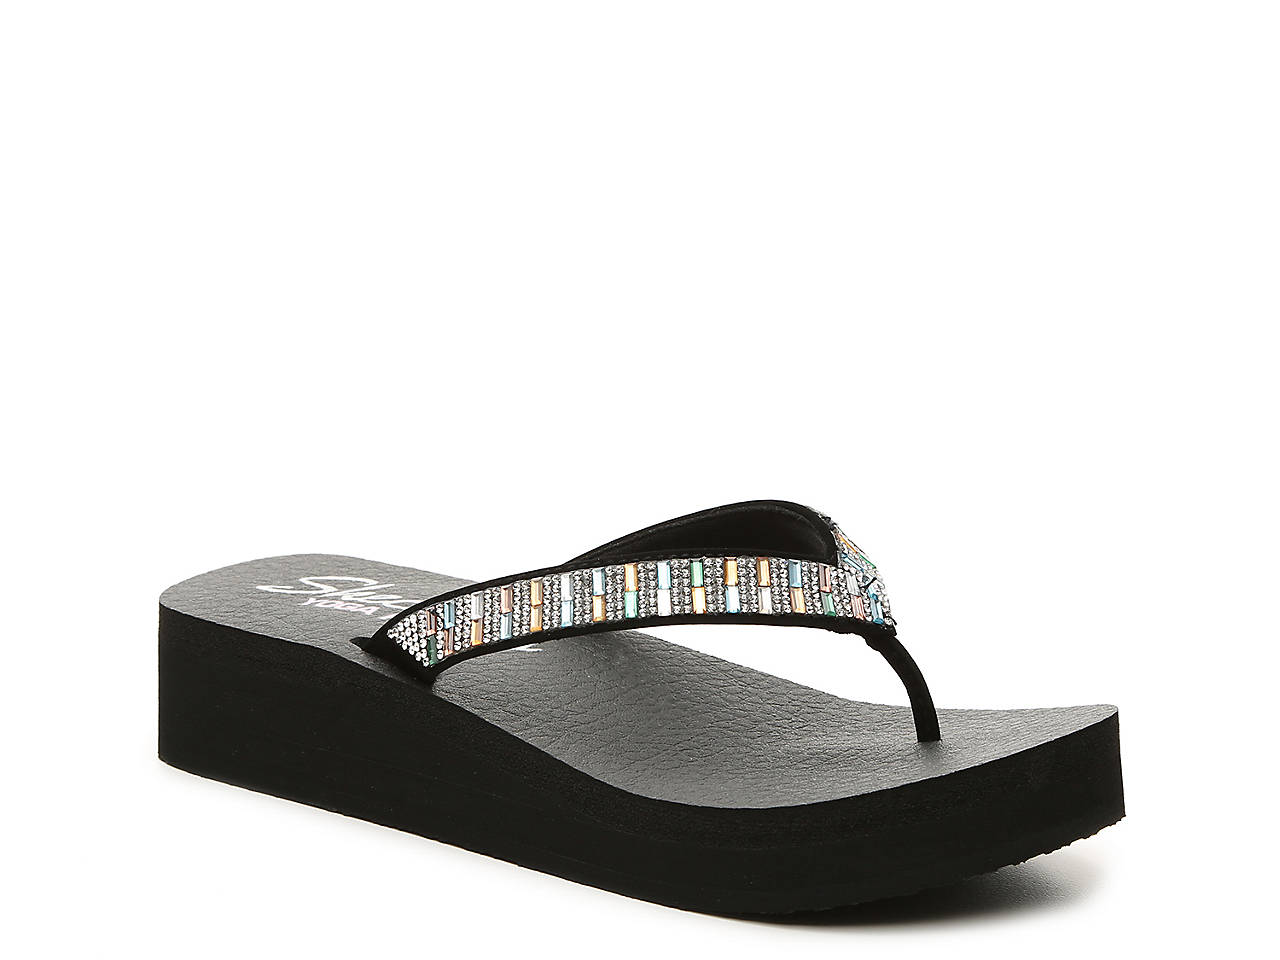 b85e64e67d0 Skechers Cali Vinyasa Paradise Found Wedge Sandal Women s Shoes